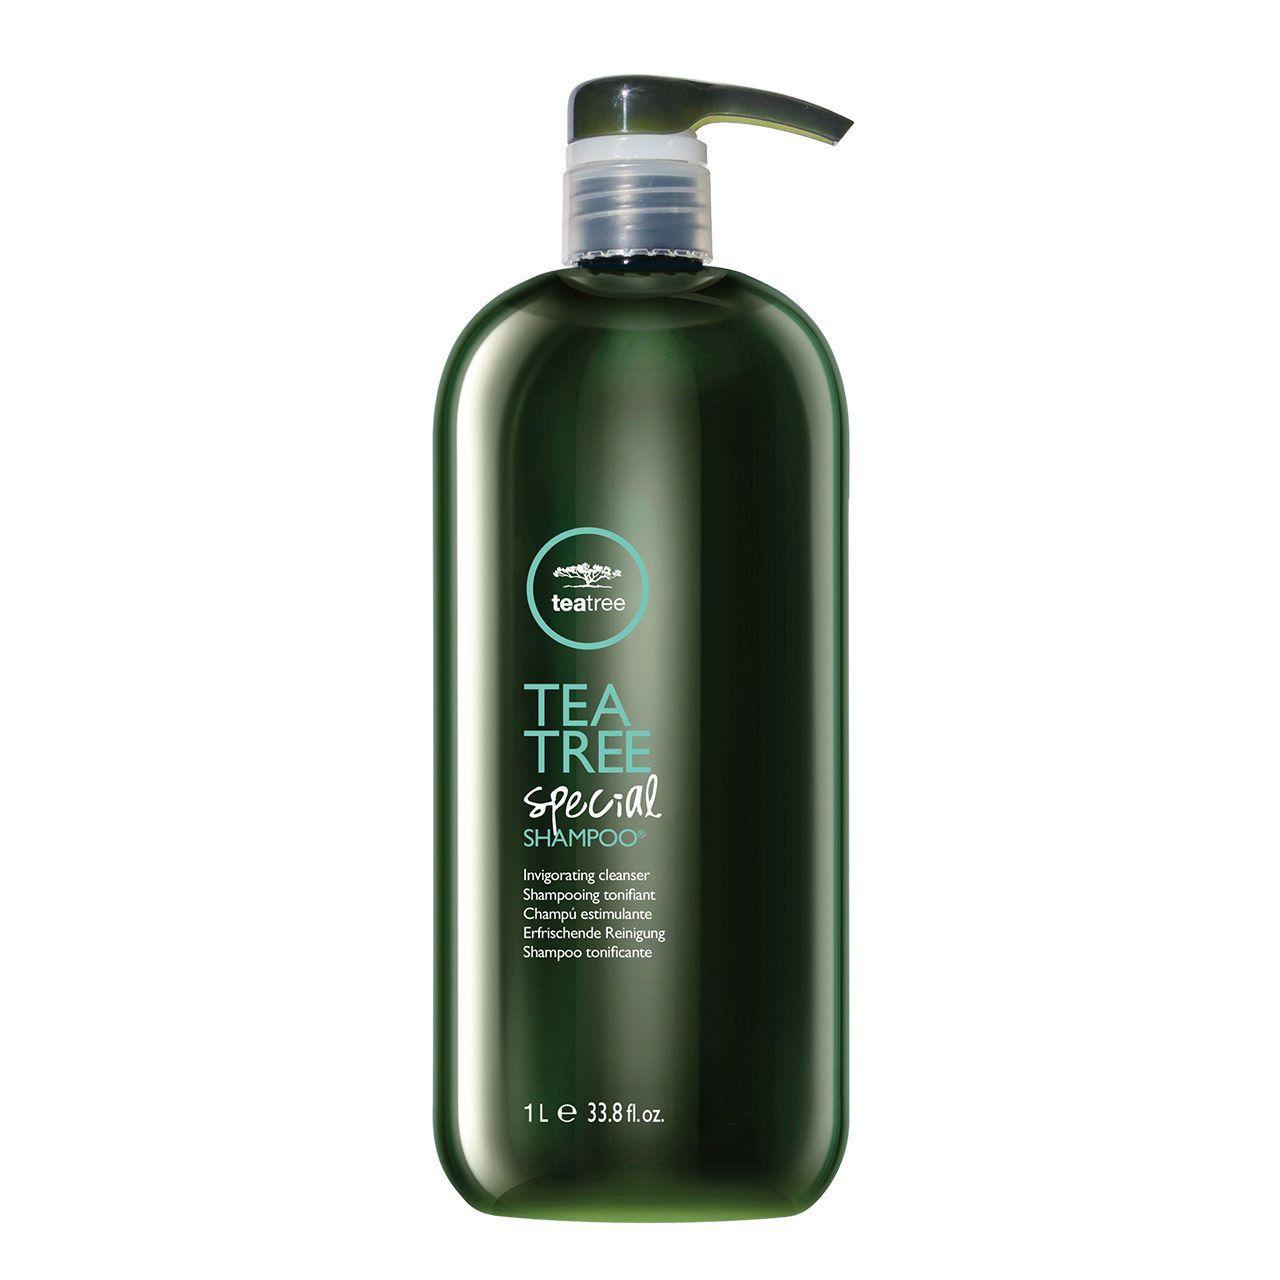 Shampoo Tea Tree Special 1000 ml - Paul Mitchell